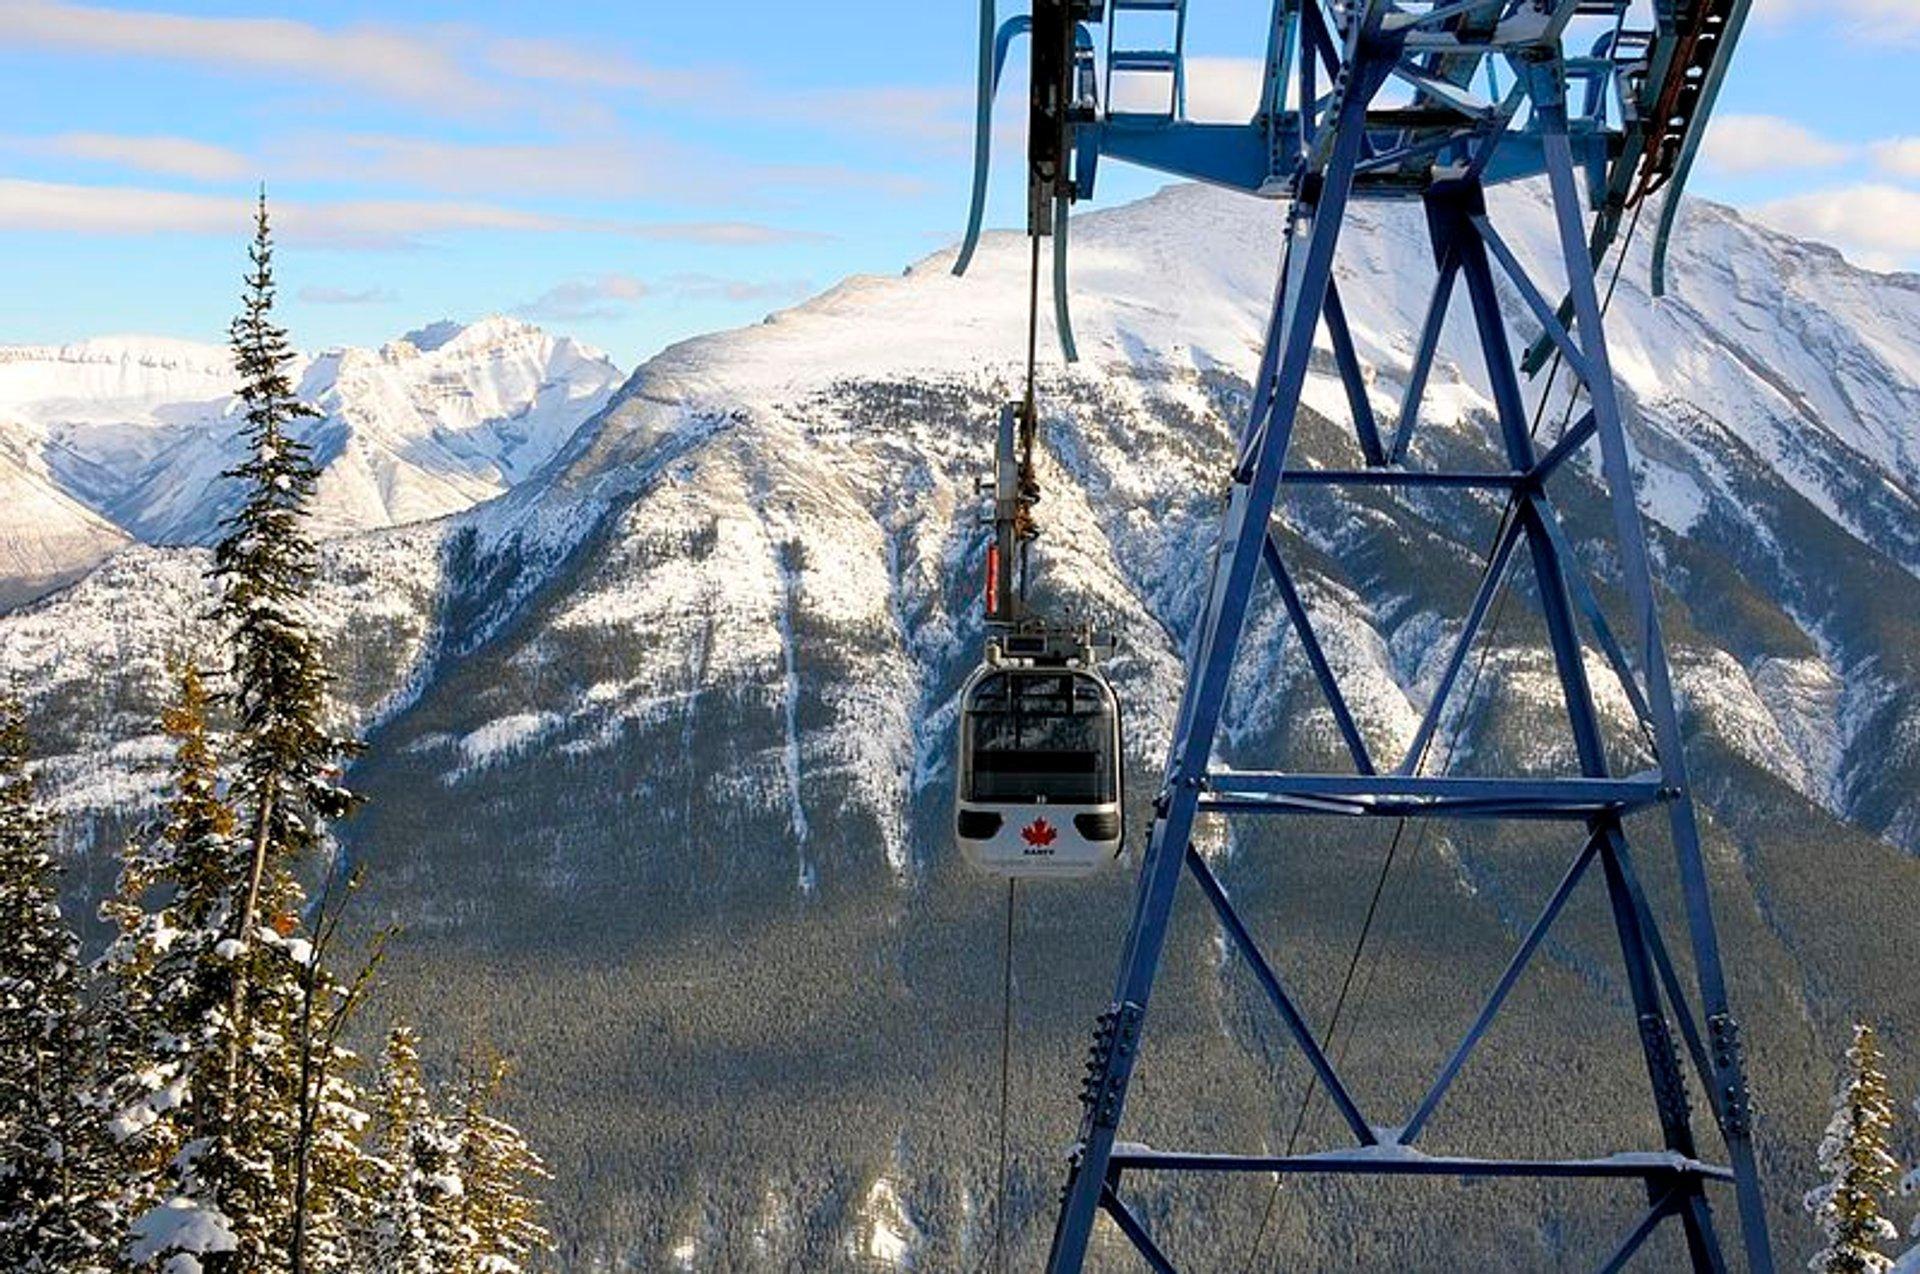 Banff Gondola in Banff & Jasper National Parks - Best Season 2020